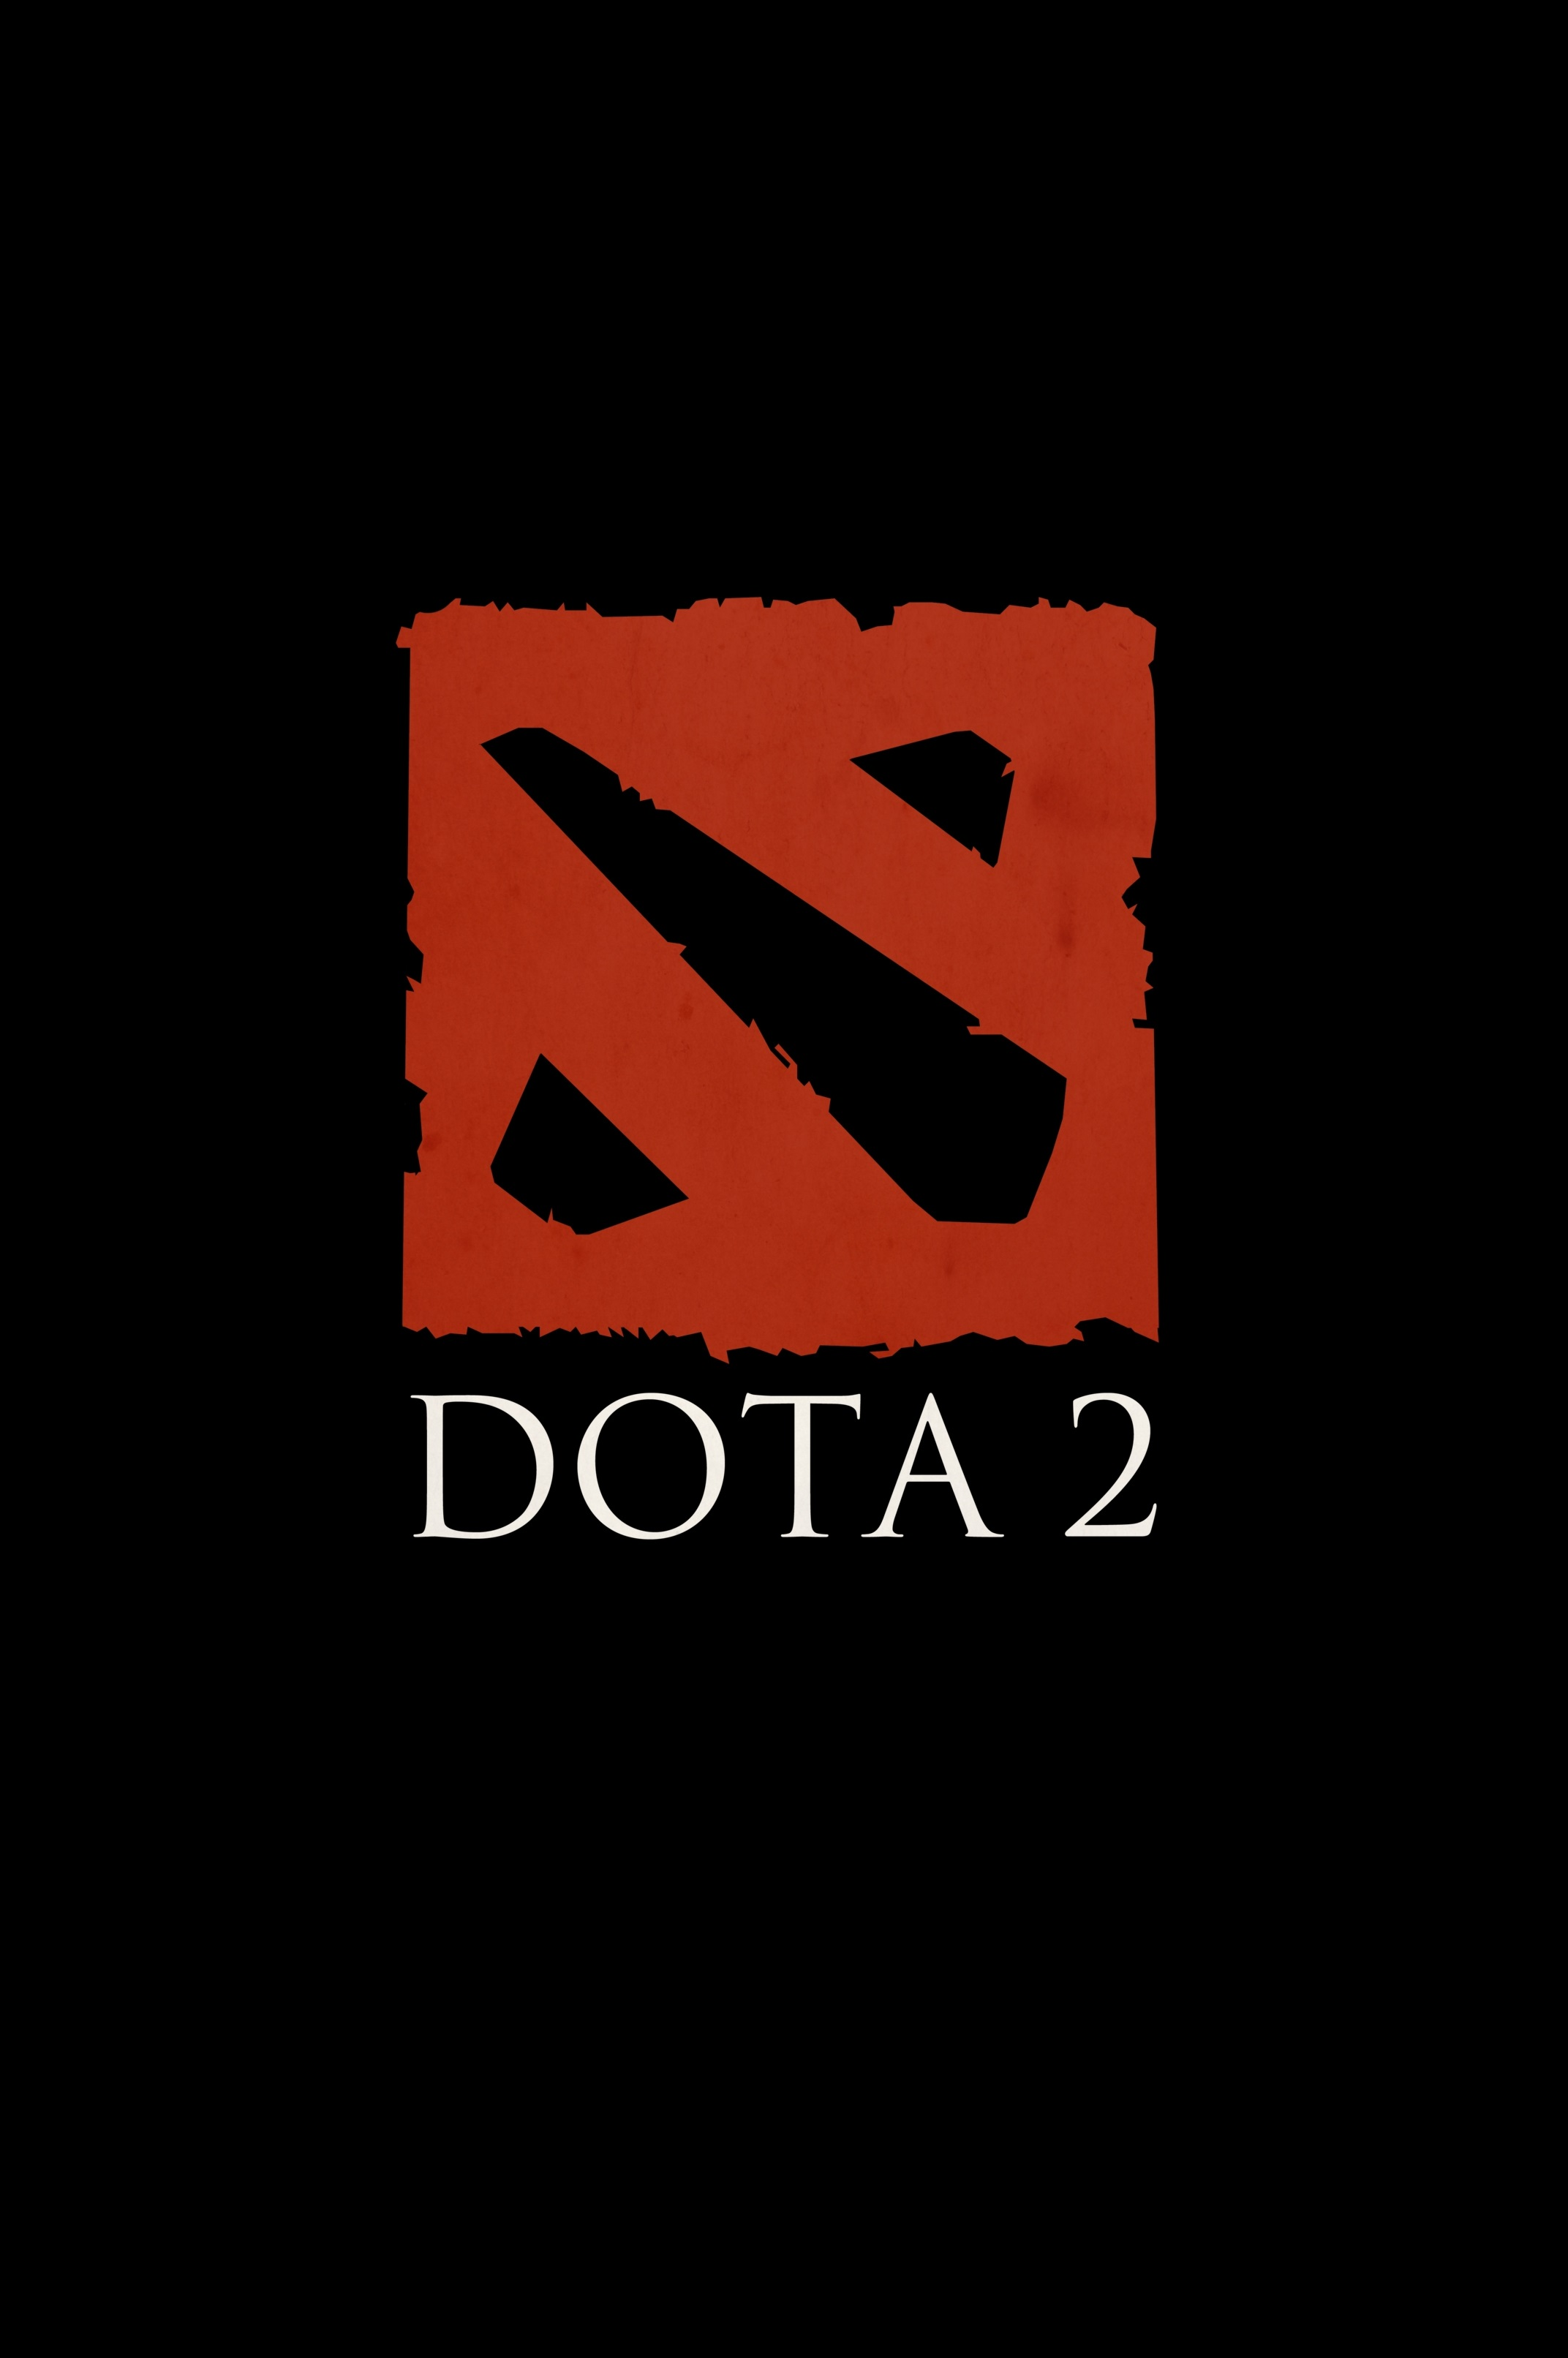 Dota 2 (Video Game 2013) - IMDb